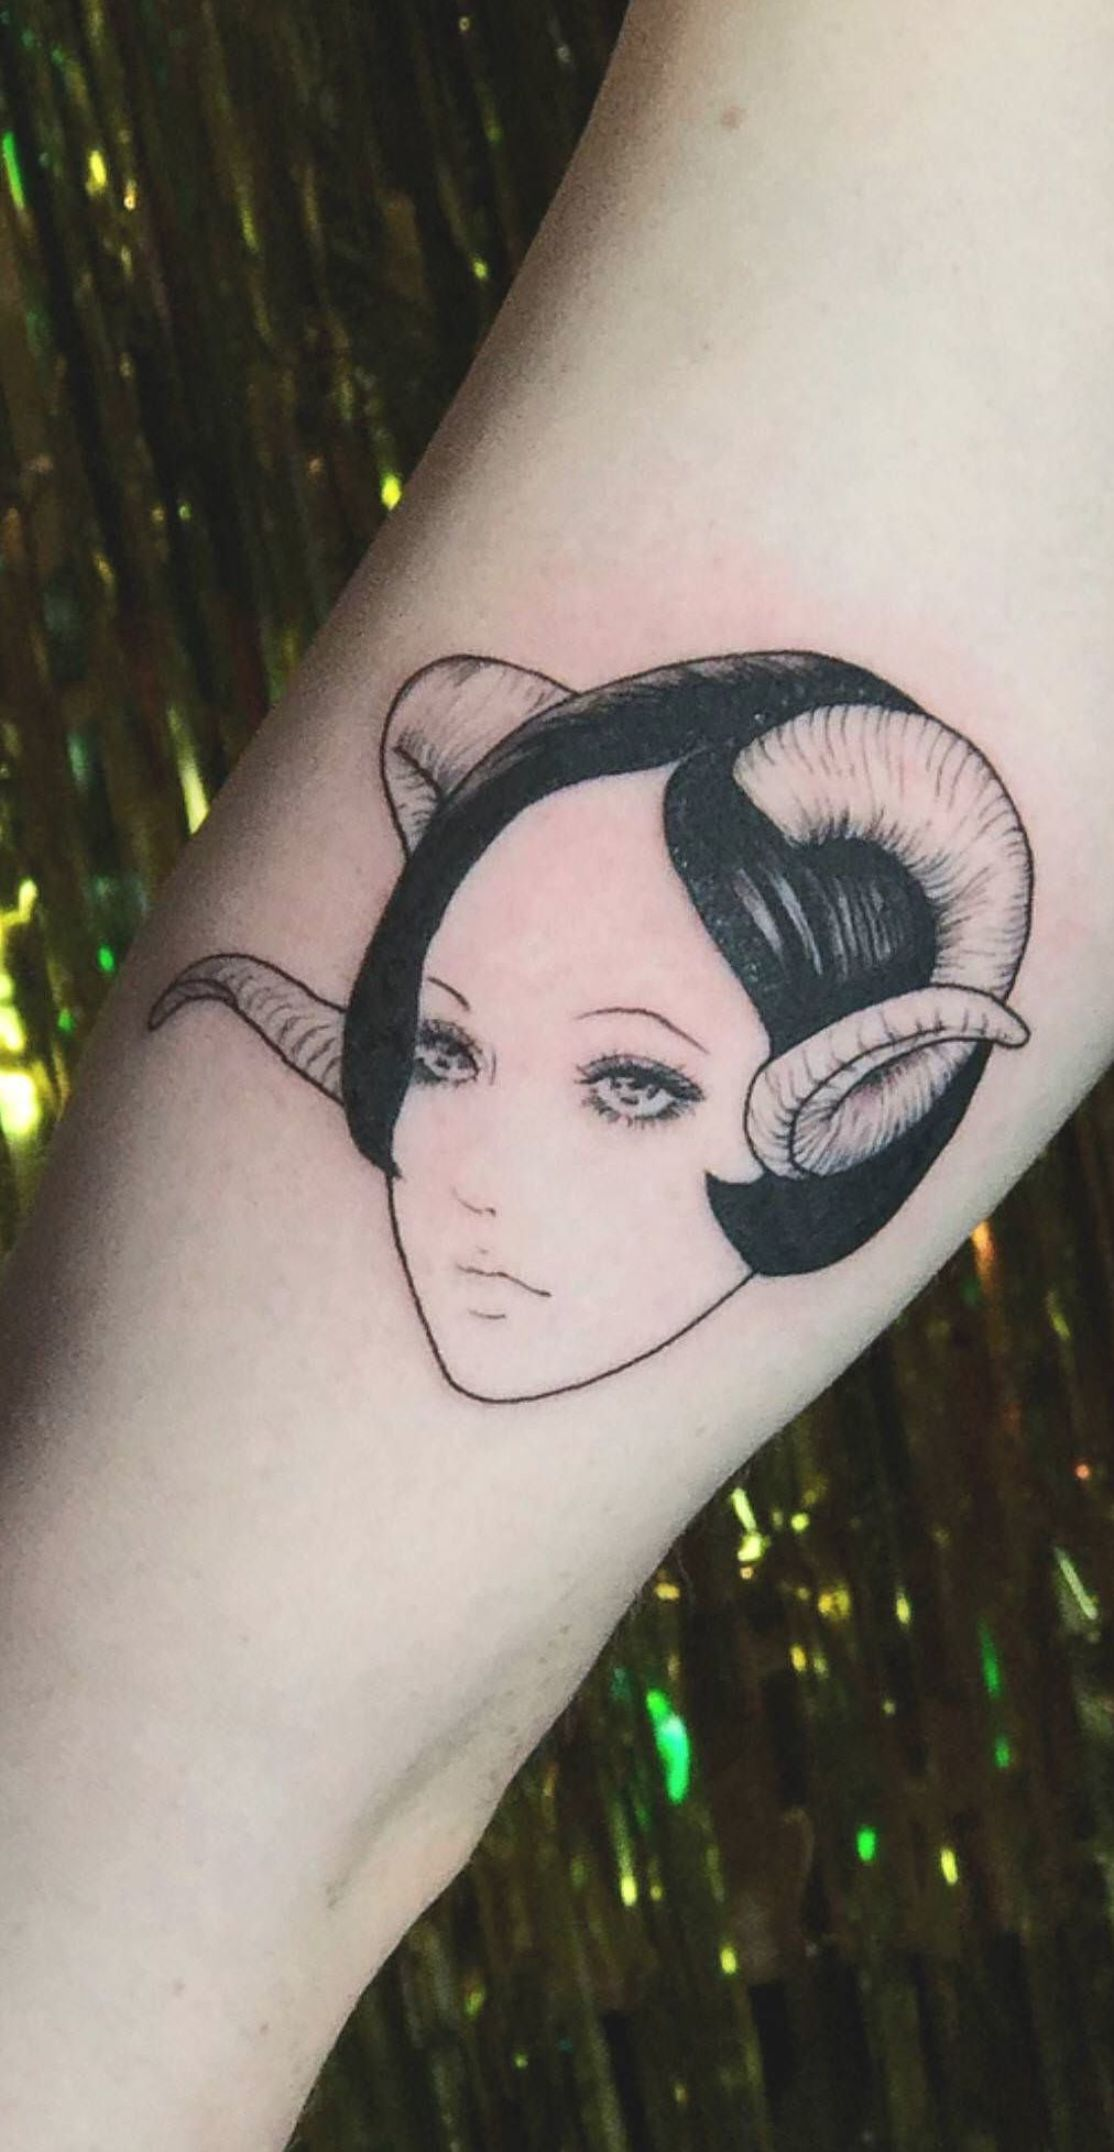 Junji Ito Style Portrait By Suzani Done At Valentine Tattoo Seattle Wa In 2020 Japanese Tattoo Tattoos Japanese Tattoo Symbols